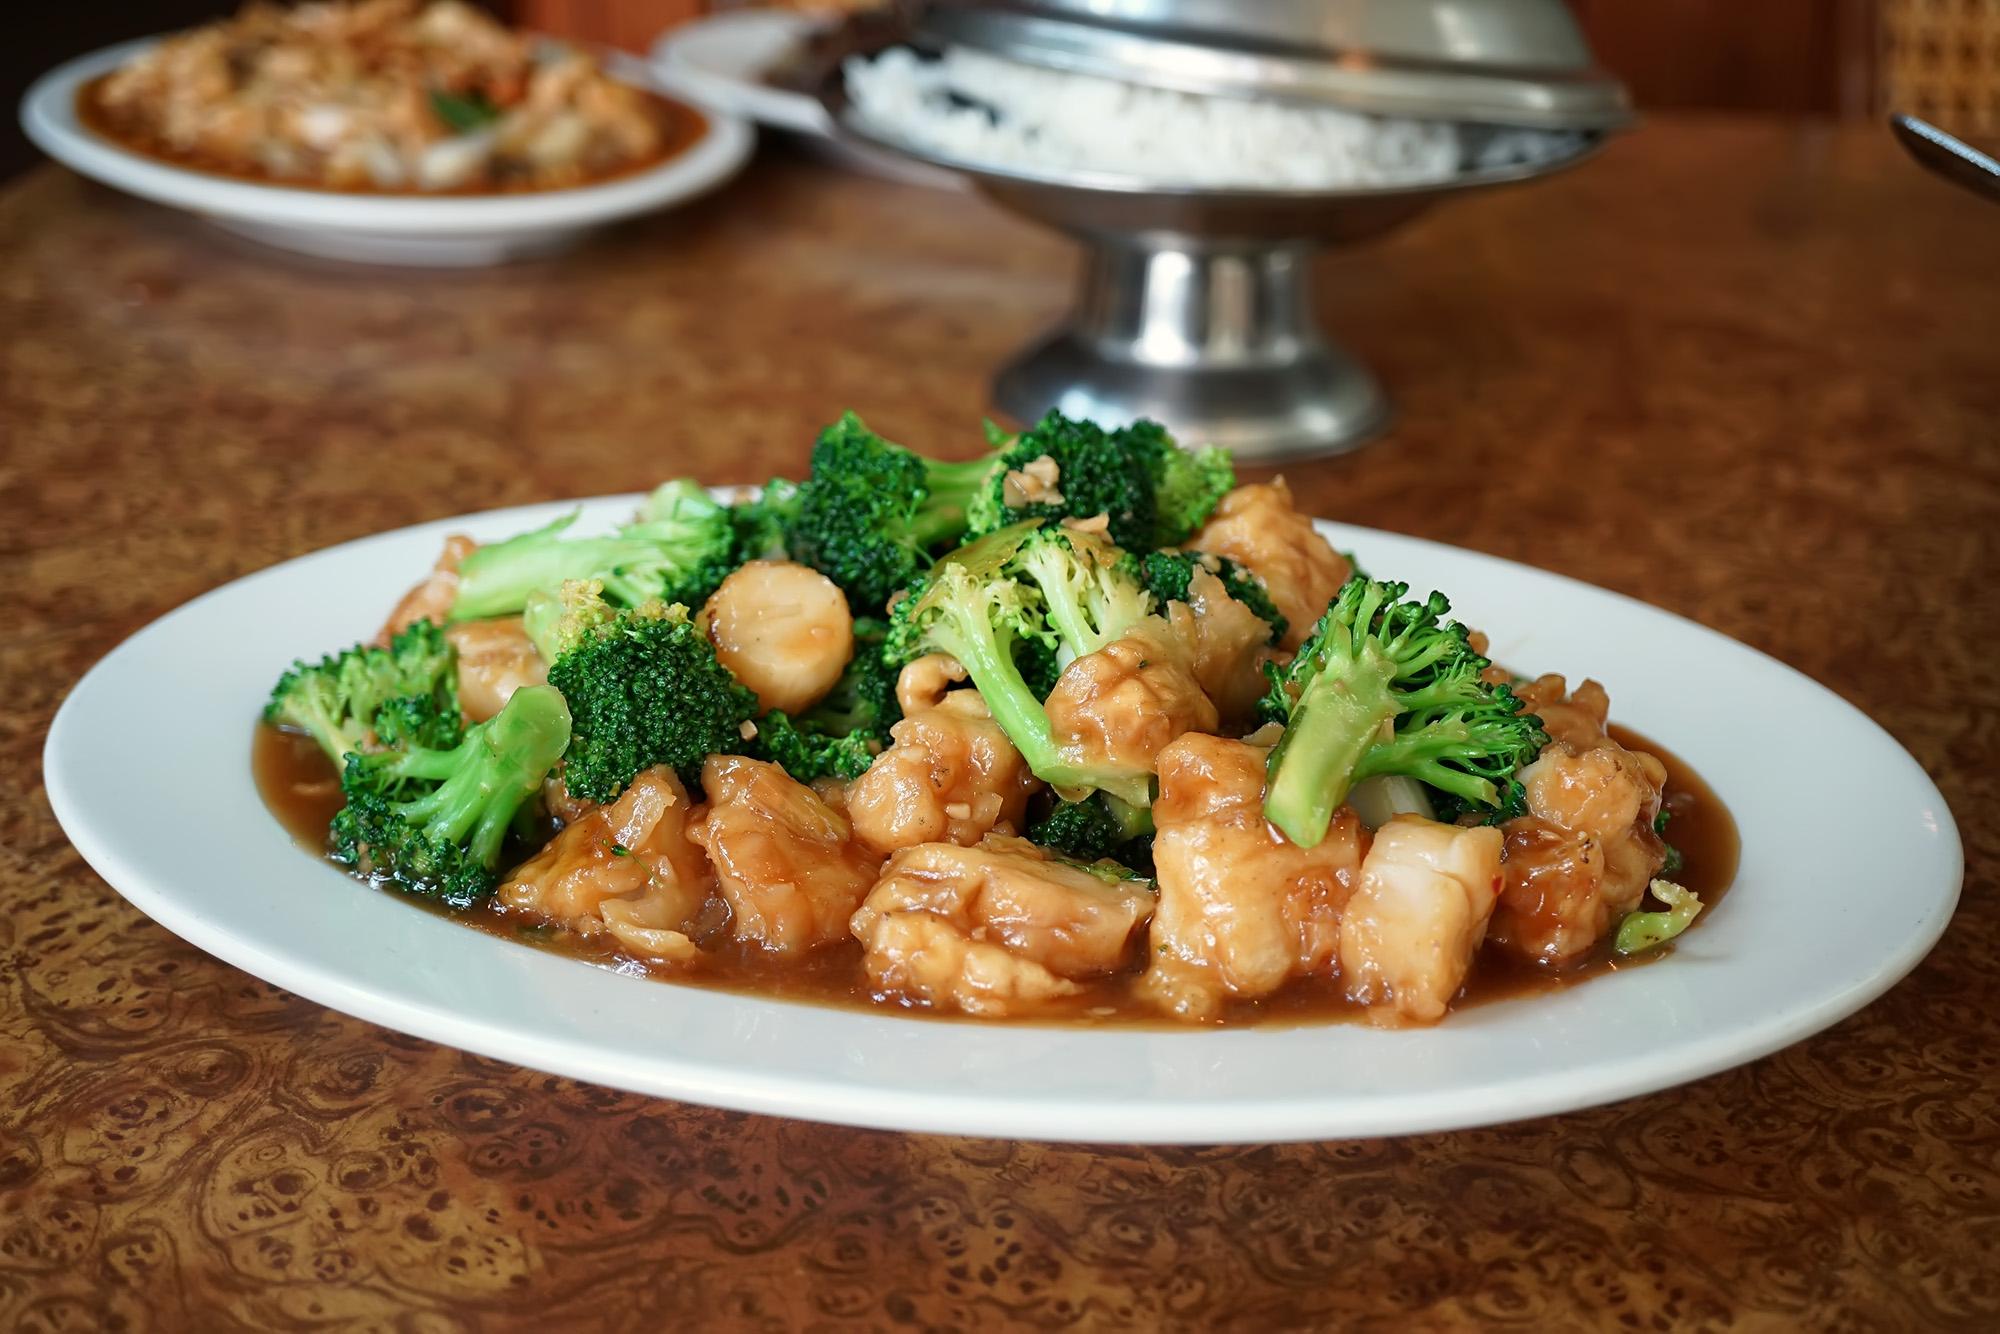 Scallops with Broccoli Image